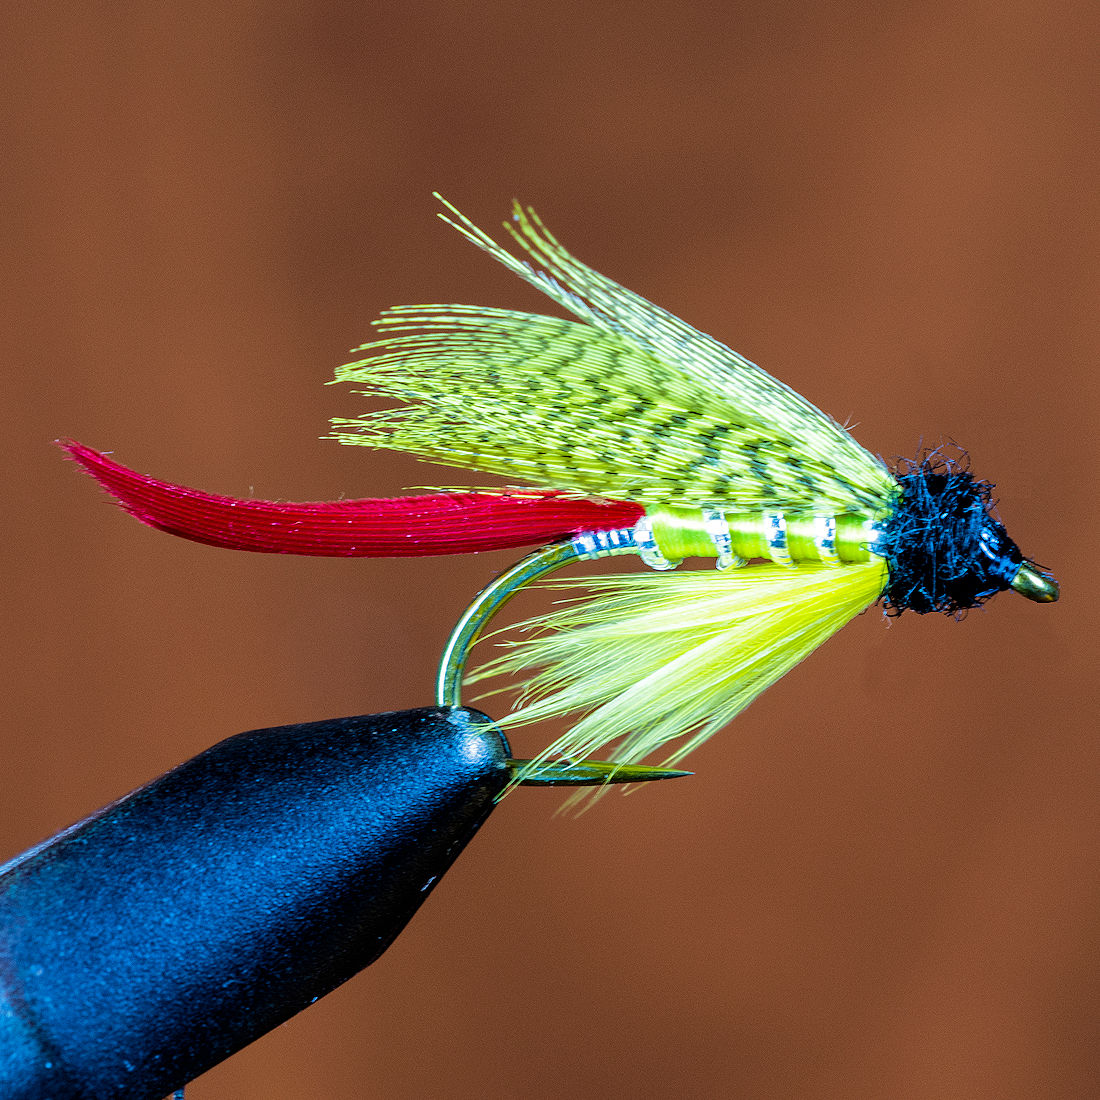 the-tim-fly-02-lrg.jpg